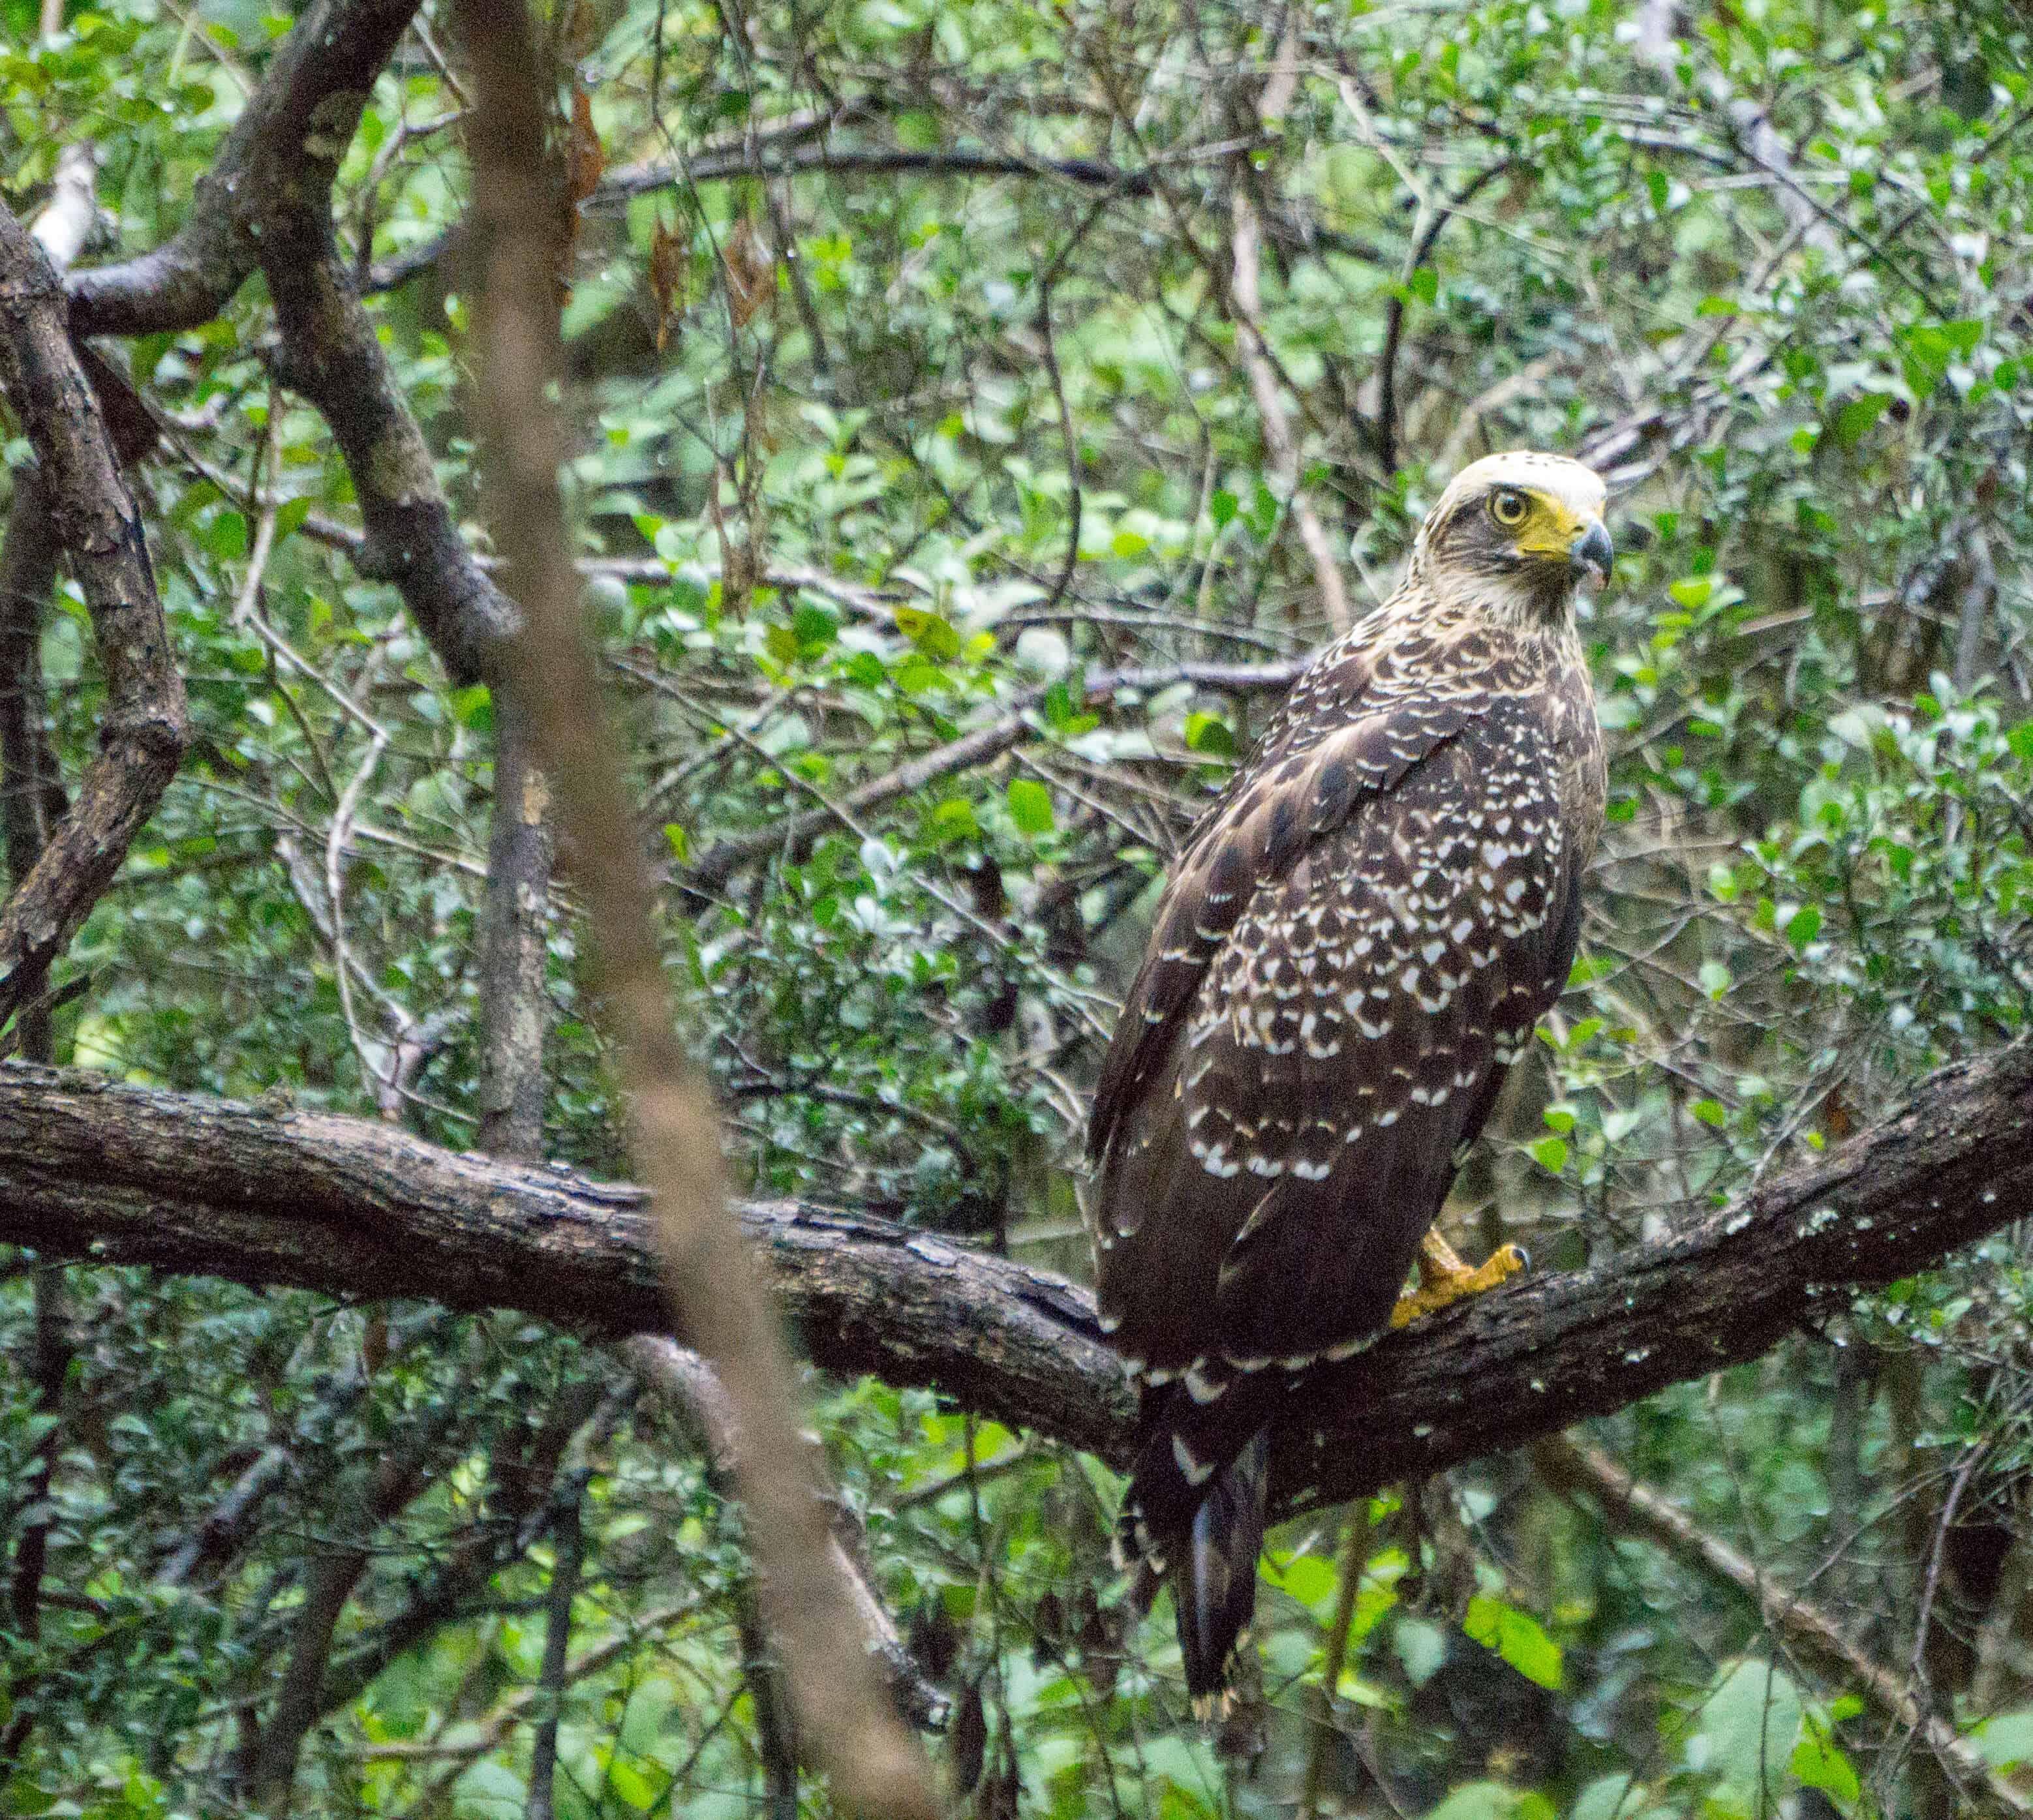 An eagle in n Wilpattu National Park